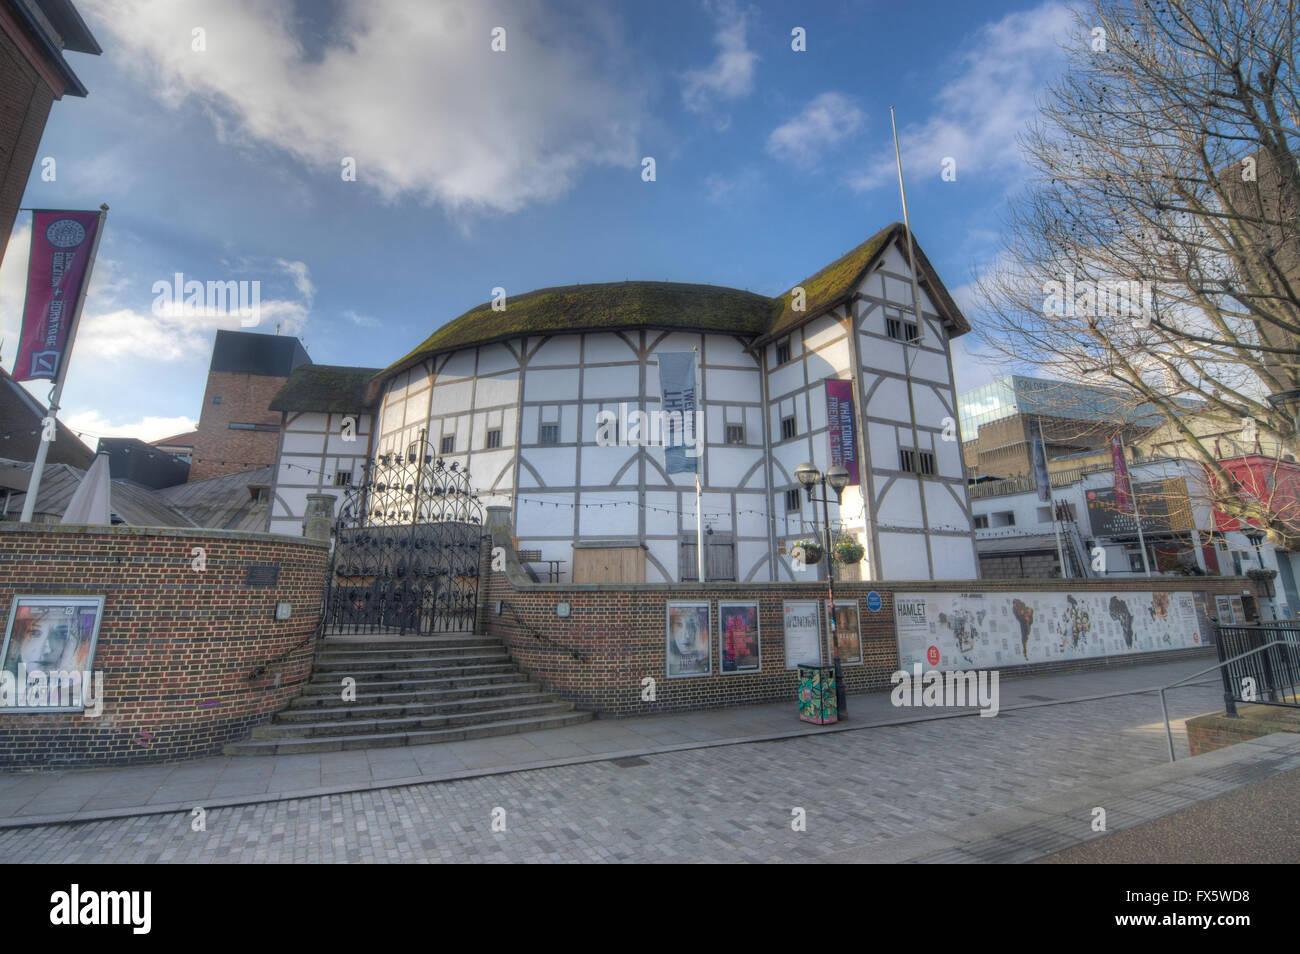 The globe theatre london shakespeares globe tudor theatre stock the globe theatre london shakespeares globe tudor theatre malvernweather Images